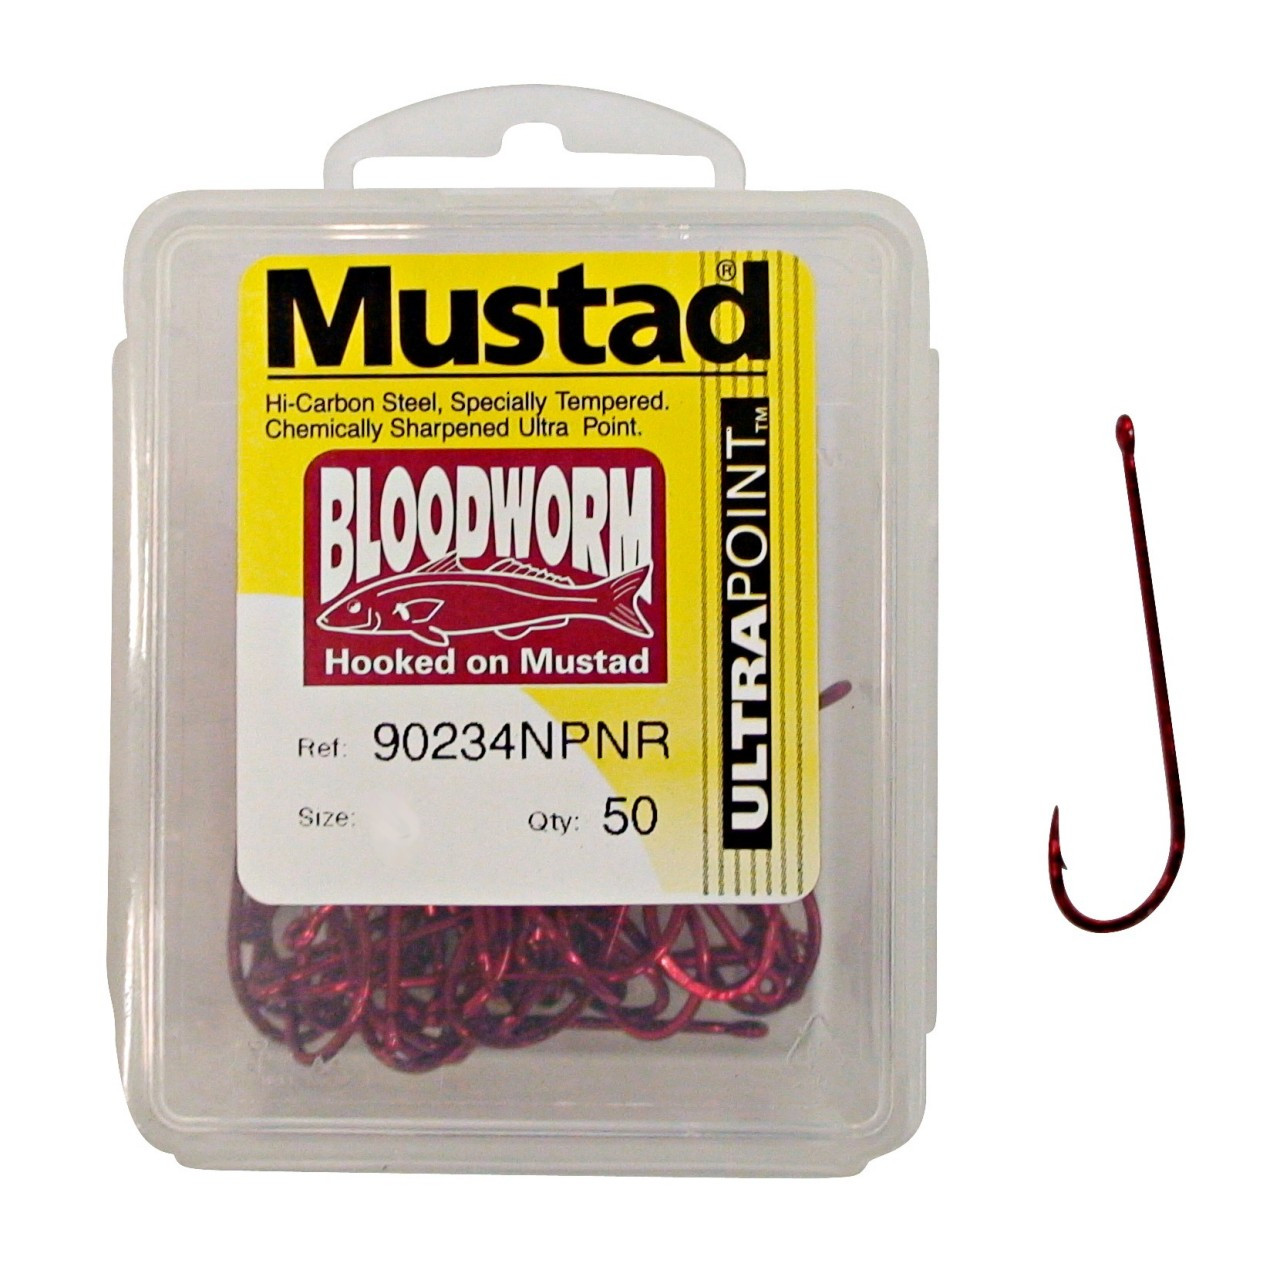 Image of Mustad Bloodworm Long Shank Fishing Hooks (50 Hooks)